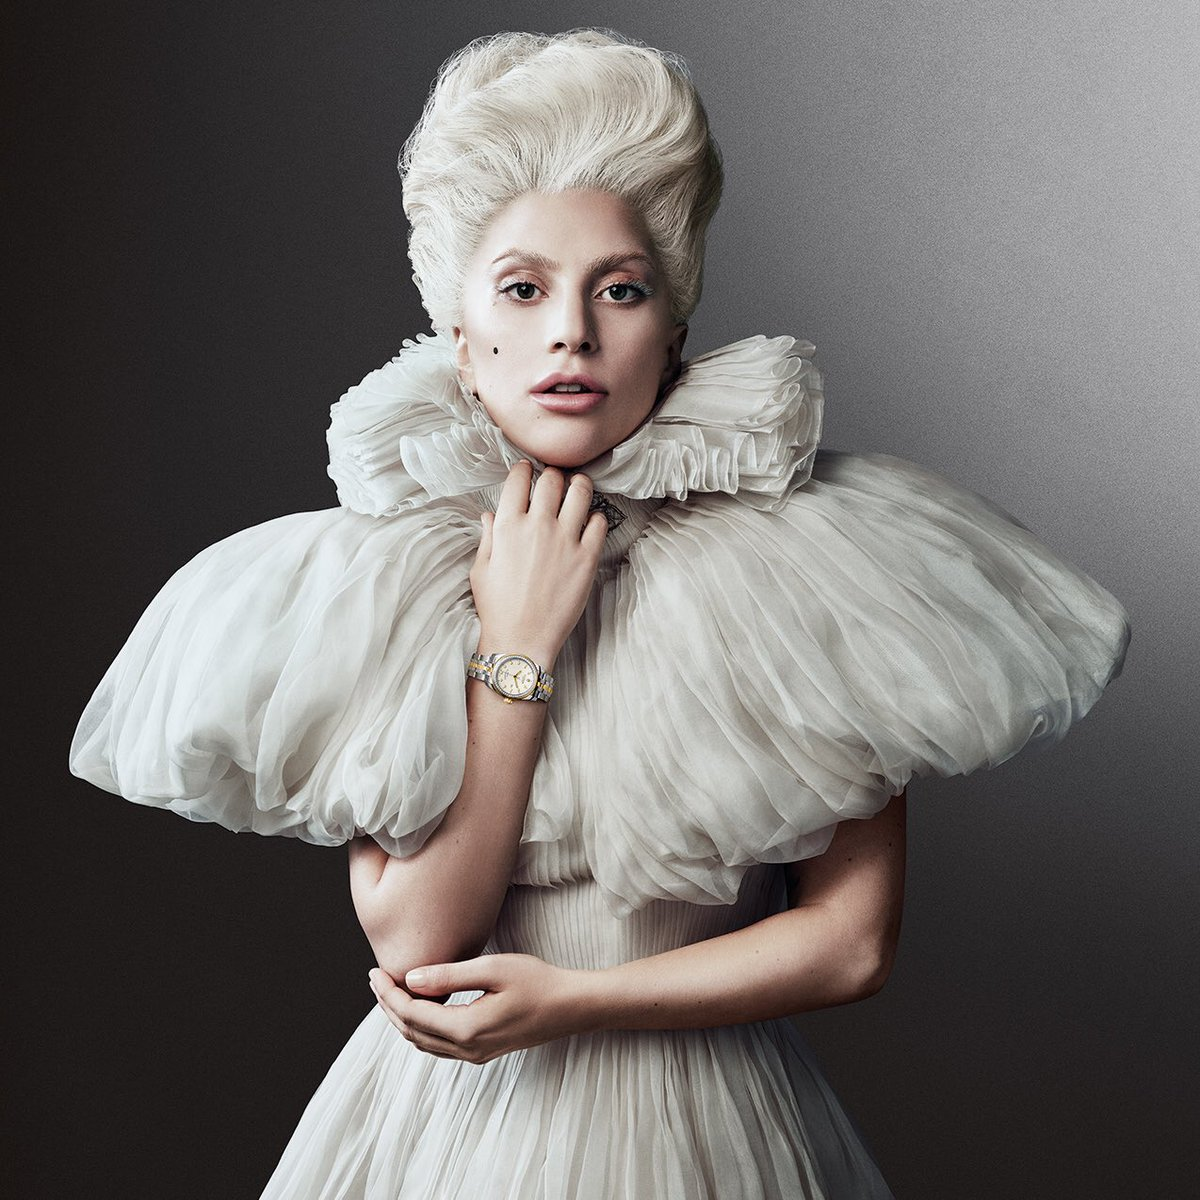 Lady Gaga: Biography, News, Photos And Videos